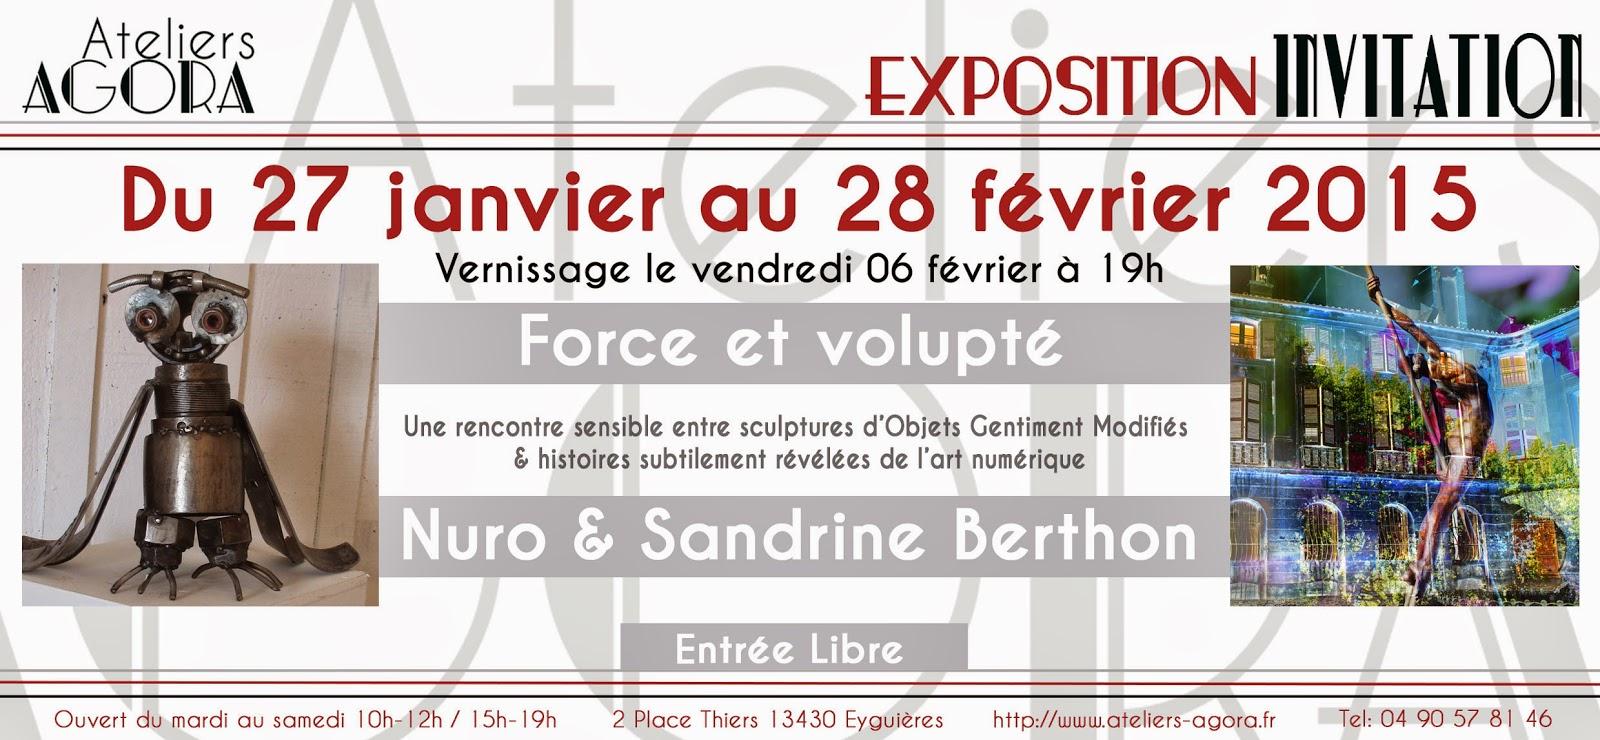 http://ateliersagora.blogspot.com/2015/01/expo-permanents-ateliers-agora-force-et.html